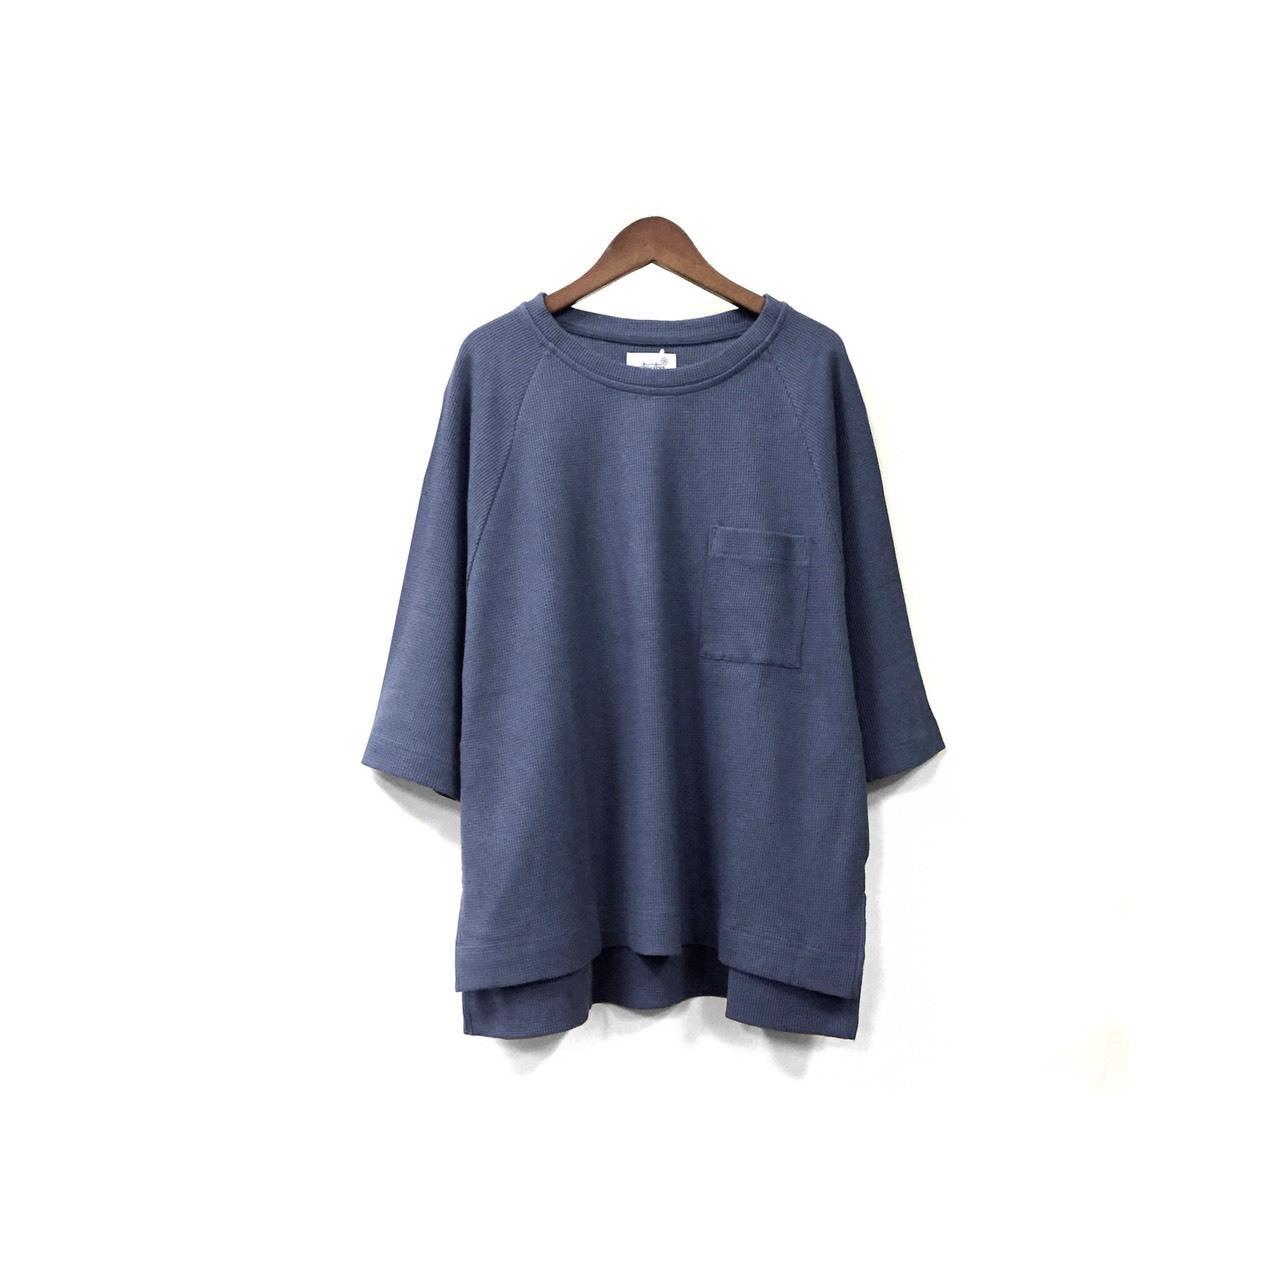 yotsuba - Thermal Tops / DarkBlue ¥11000+tax